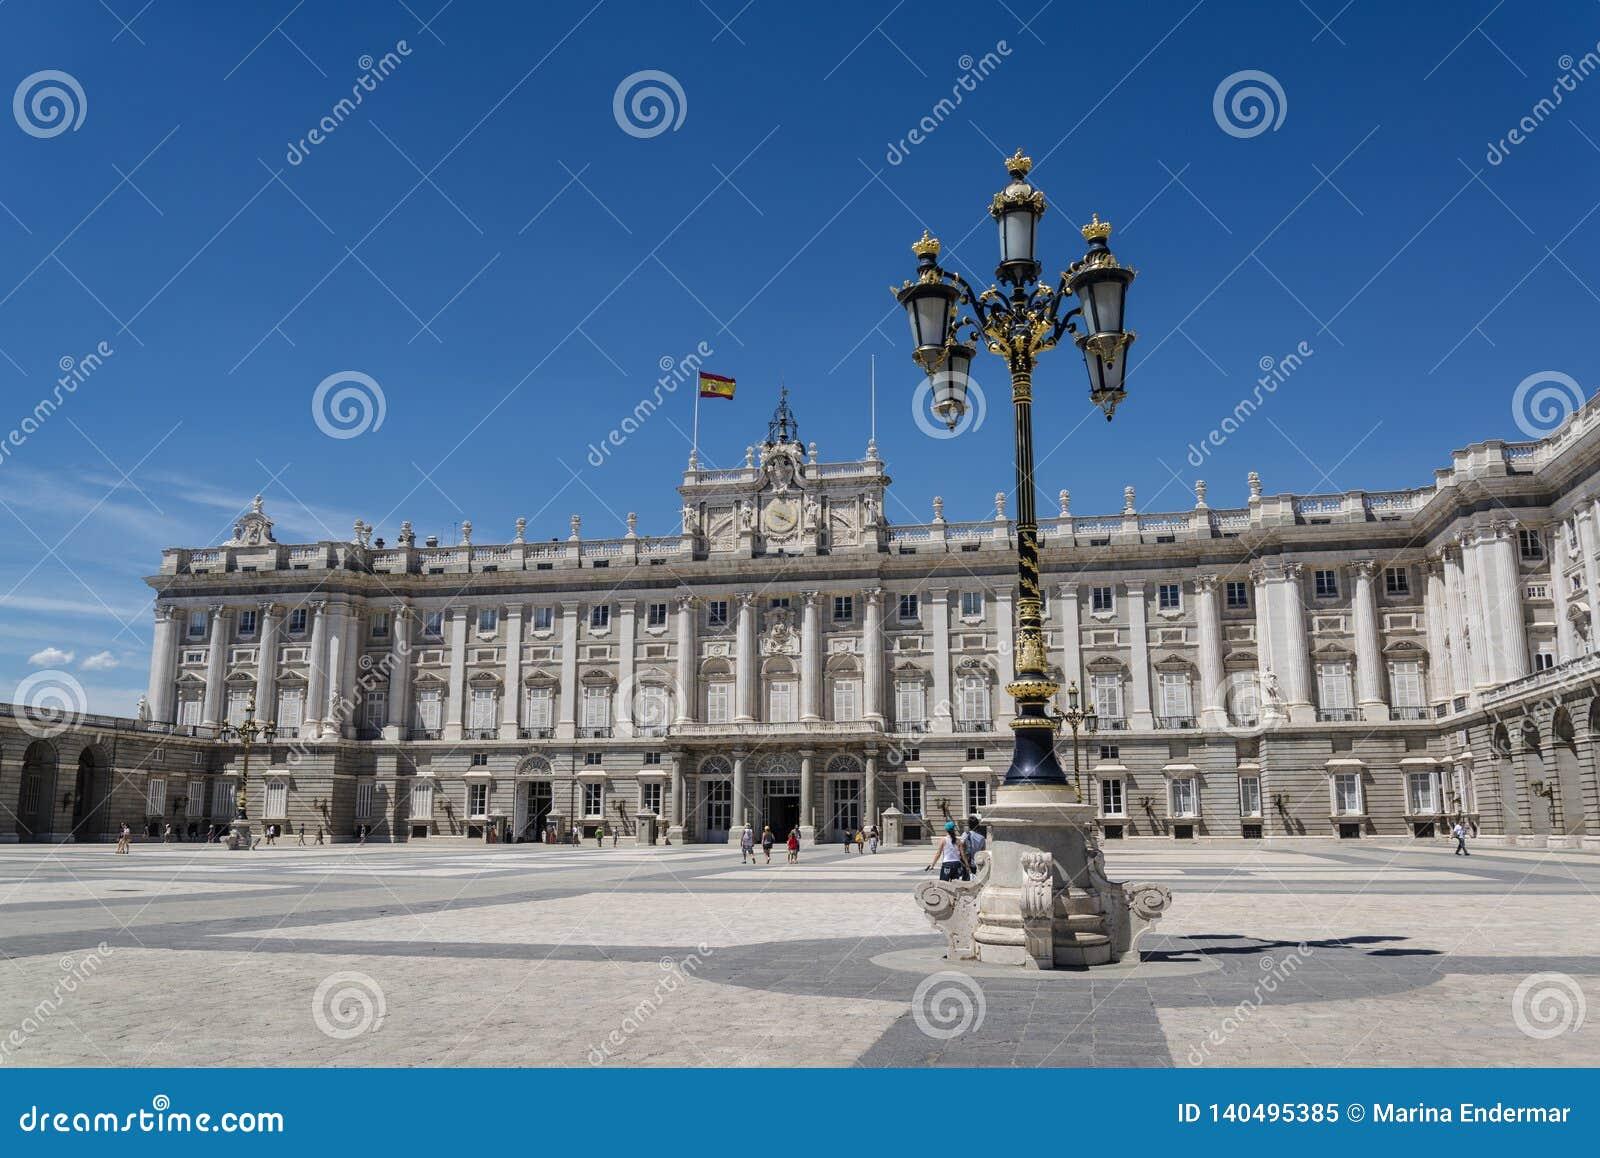 Royal Palace de Madrid, Madrid, España